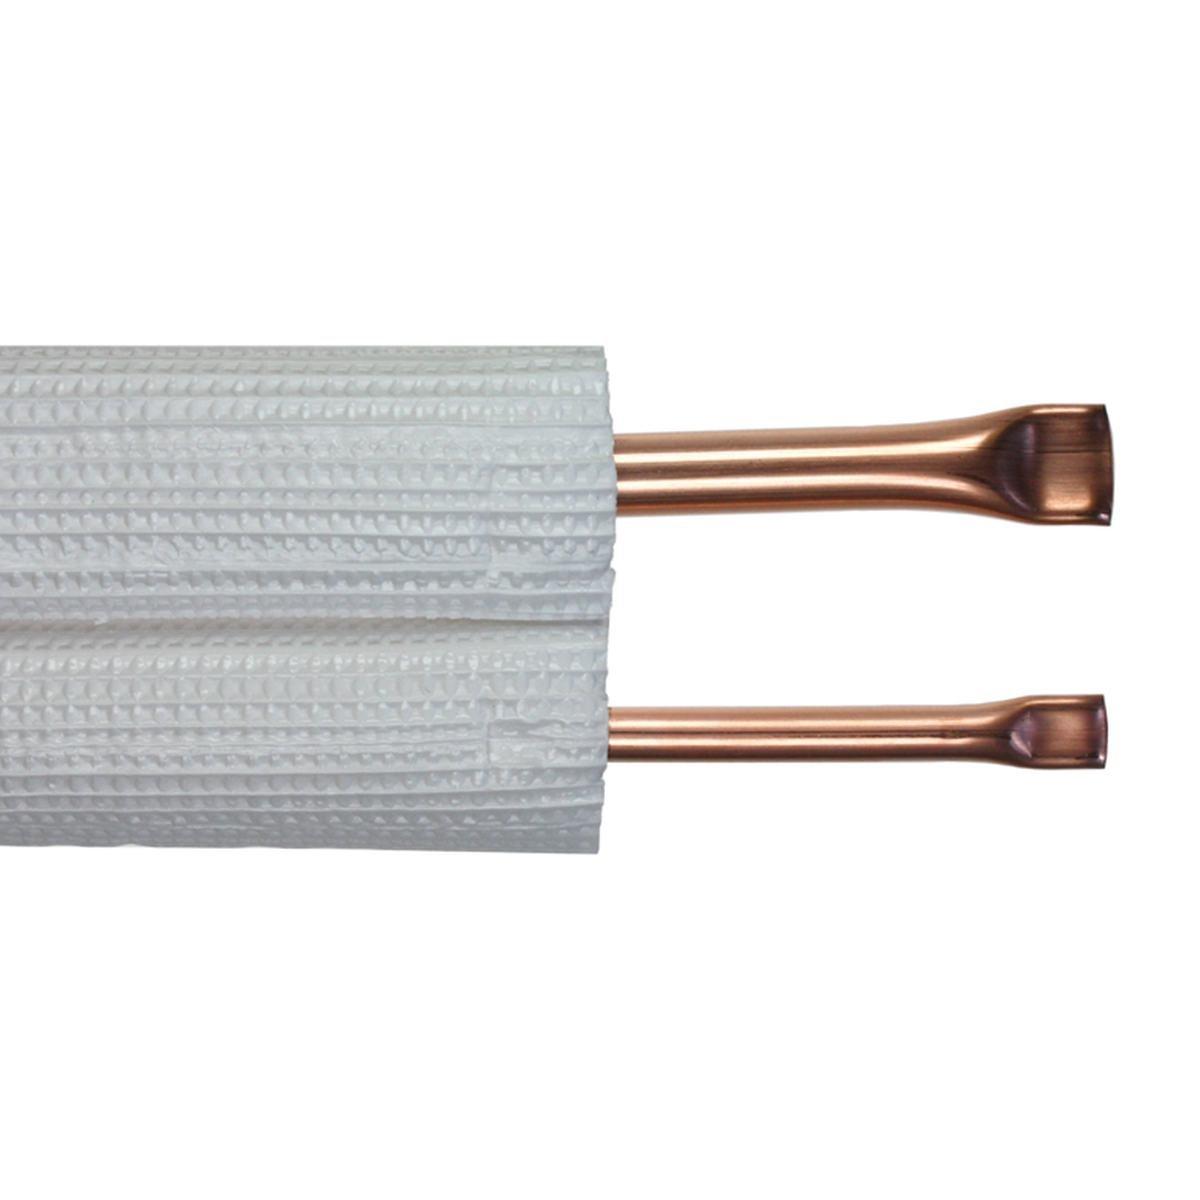 "Kopparrör isolerad dubbel 1/4""+3/8"" x 0,8 mm. 20 m"